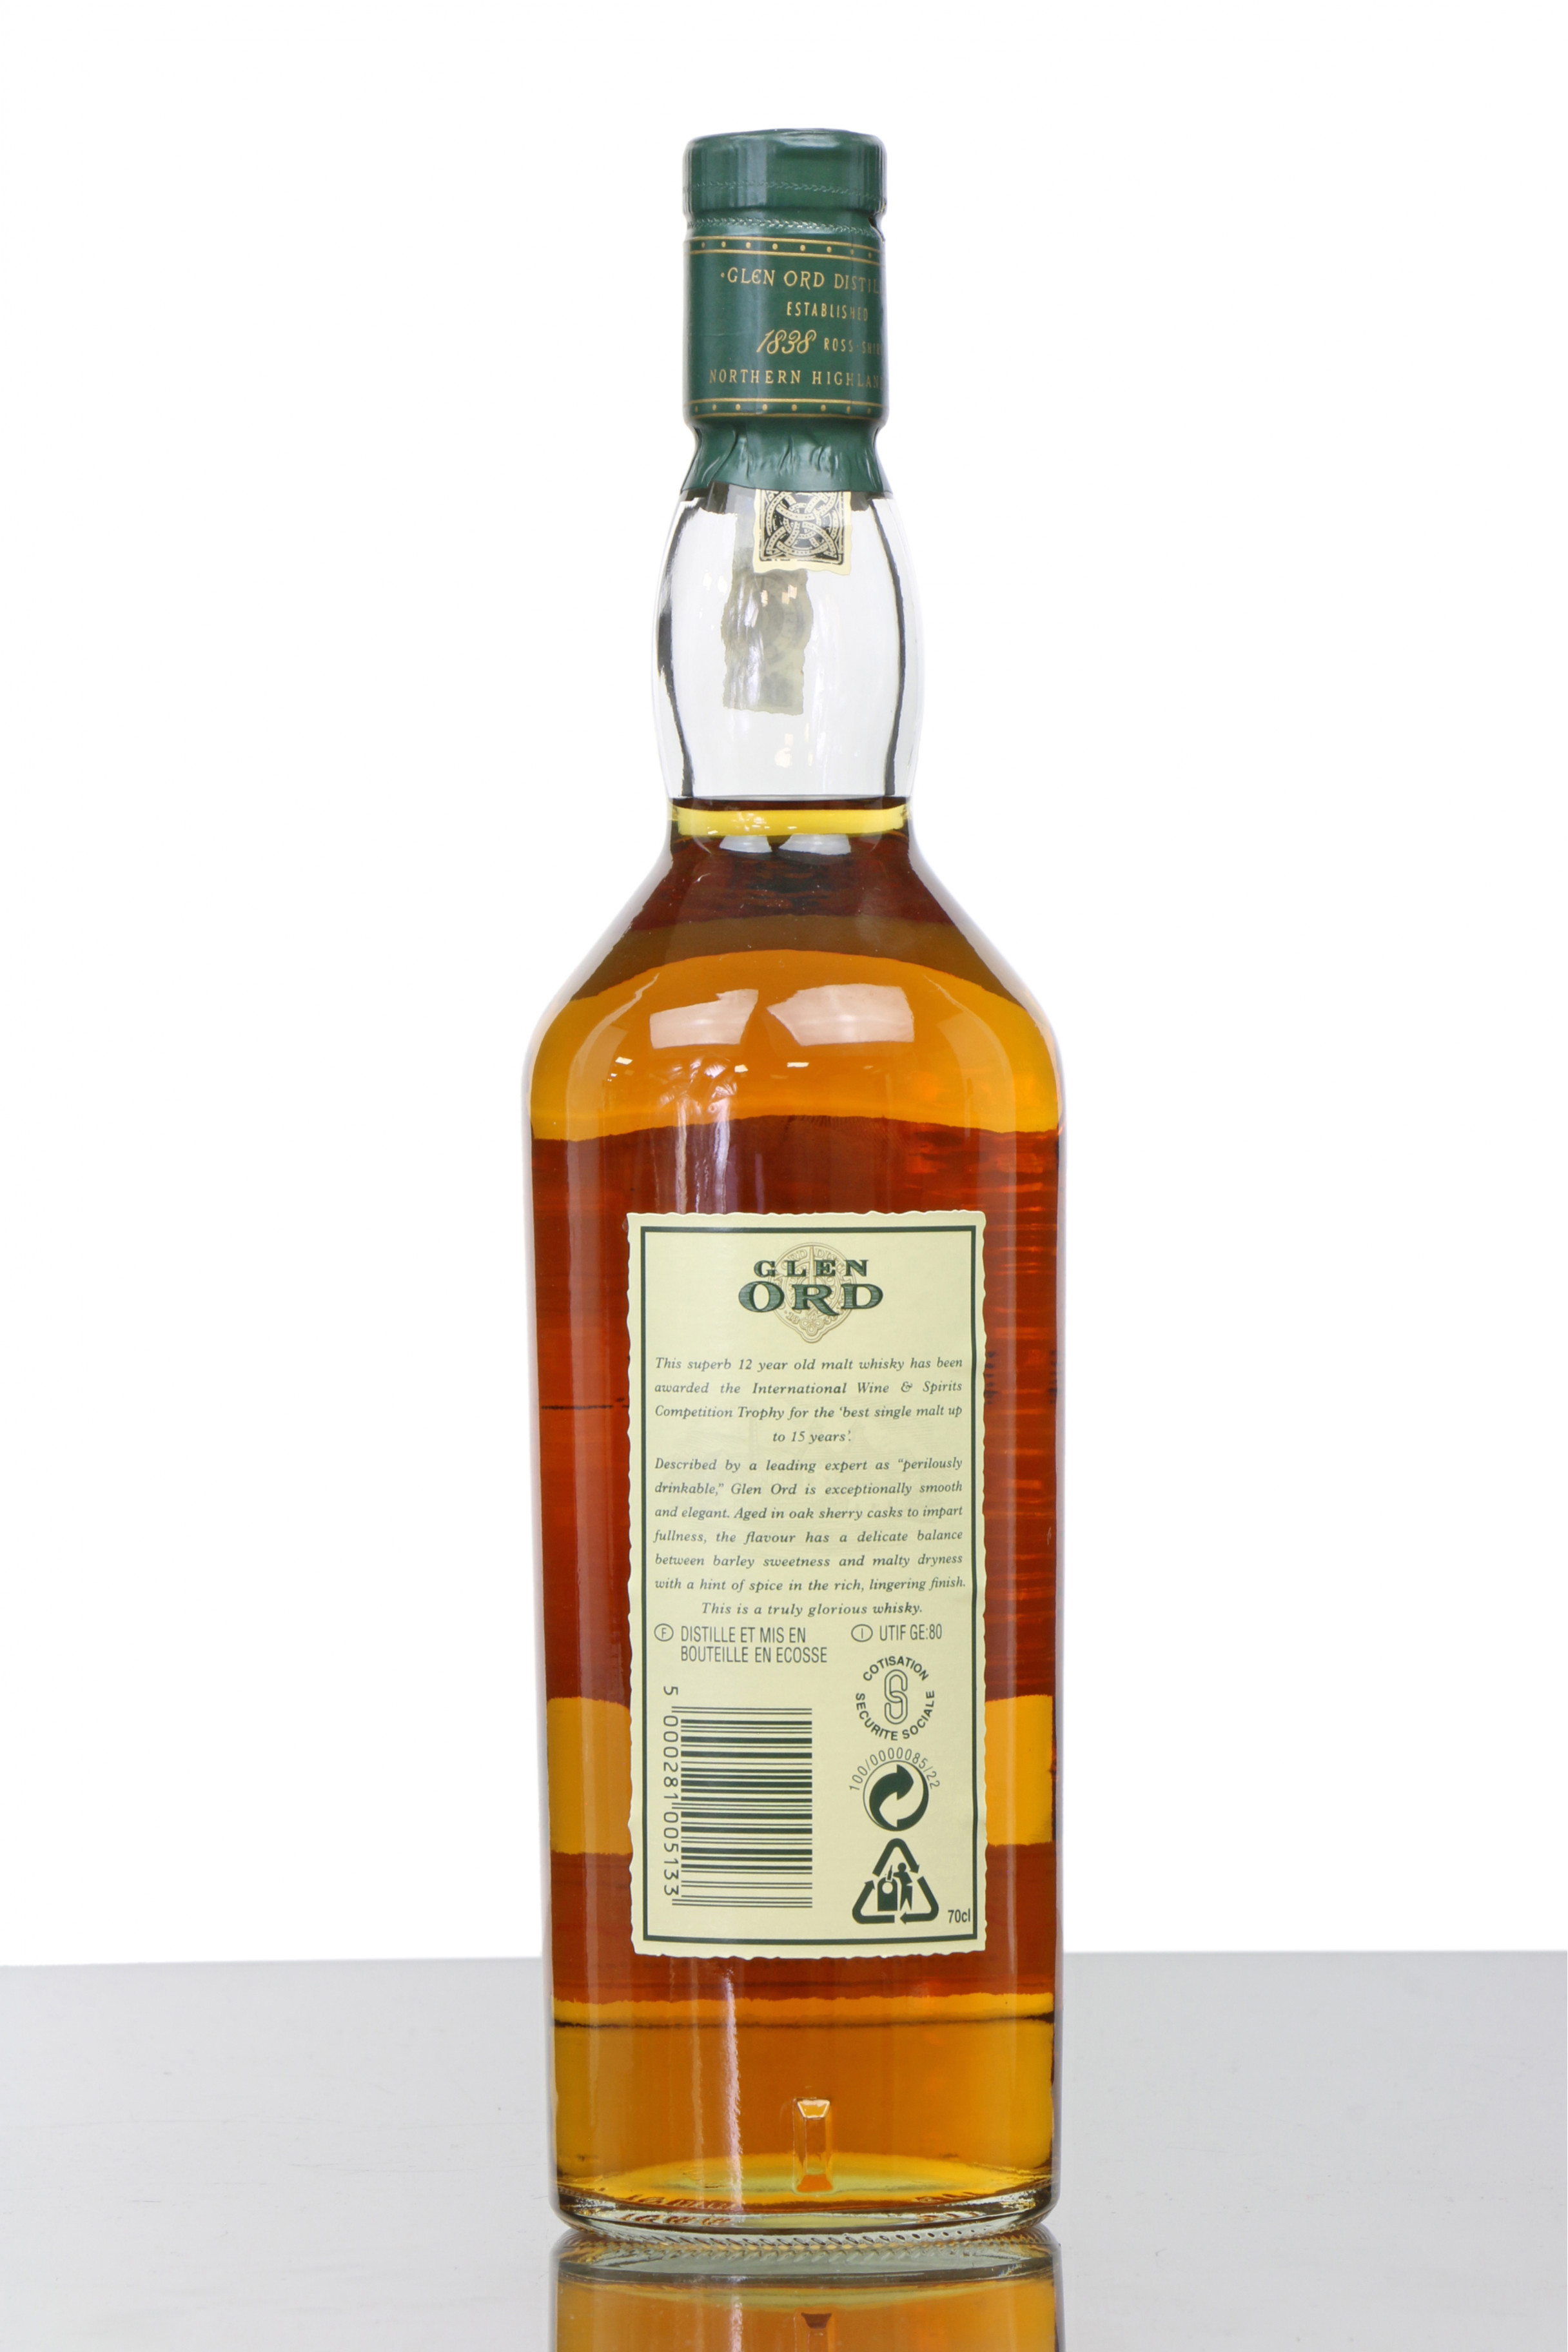 Singleton of Glen Ord 18 Year Old Single Malt Scotch